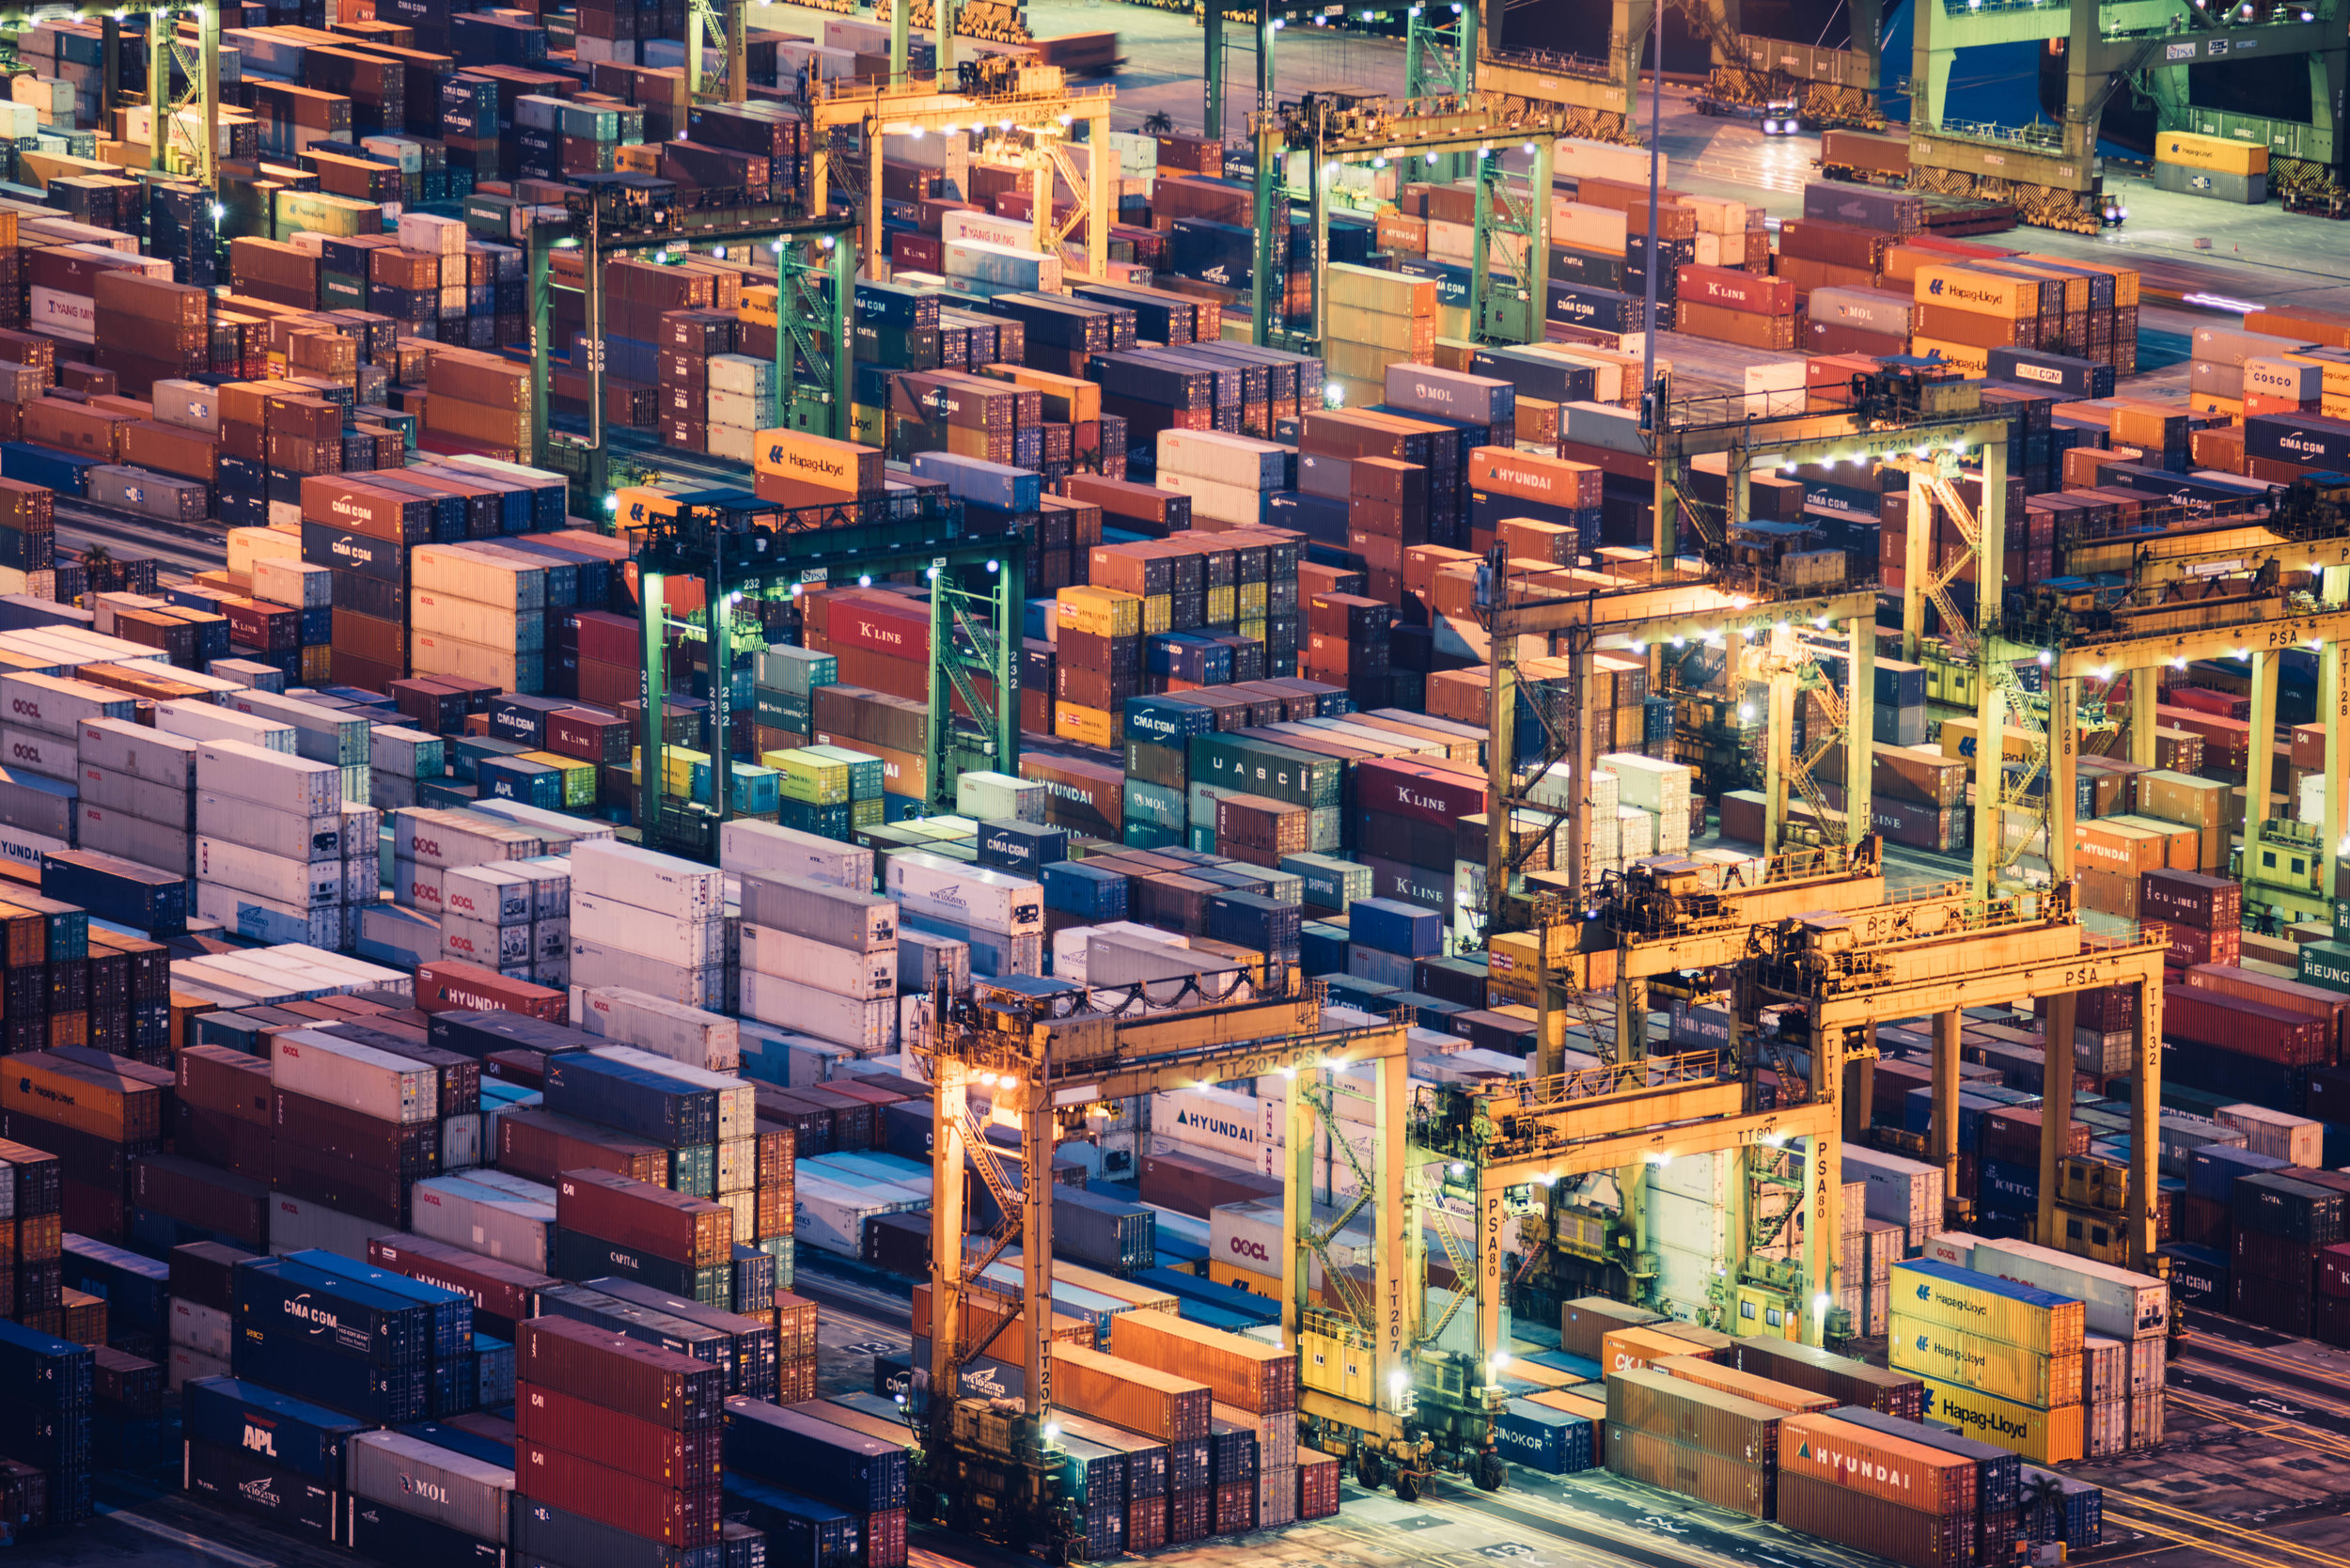 LOGISTICS & PROCUREMENT - Through our partners Eagle Global Logistics Group and Blue Anchor, we provide:- Global Multi-modal Logistics Services- Procurement- Ship Chandlery- Hostile Environment Services